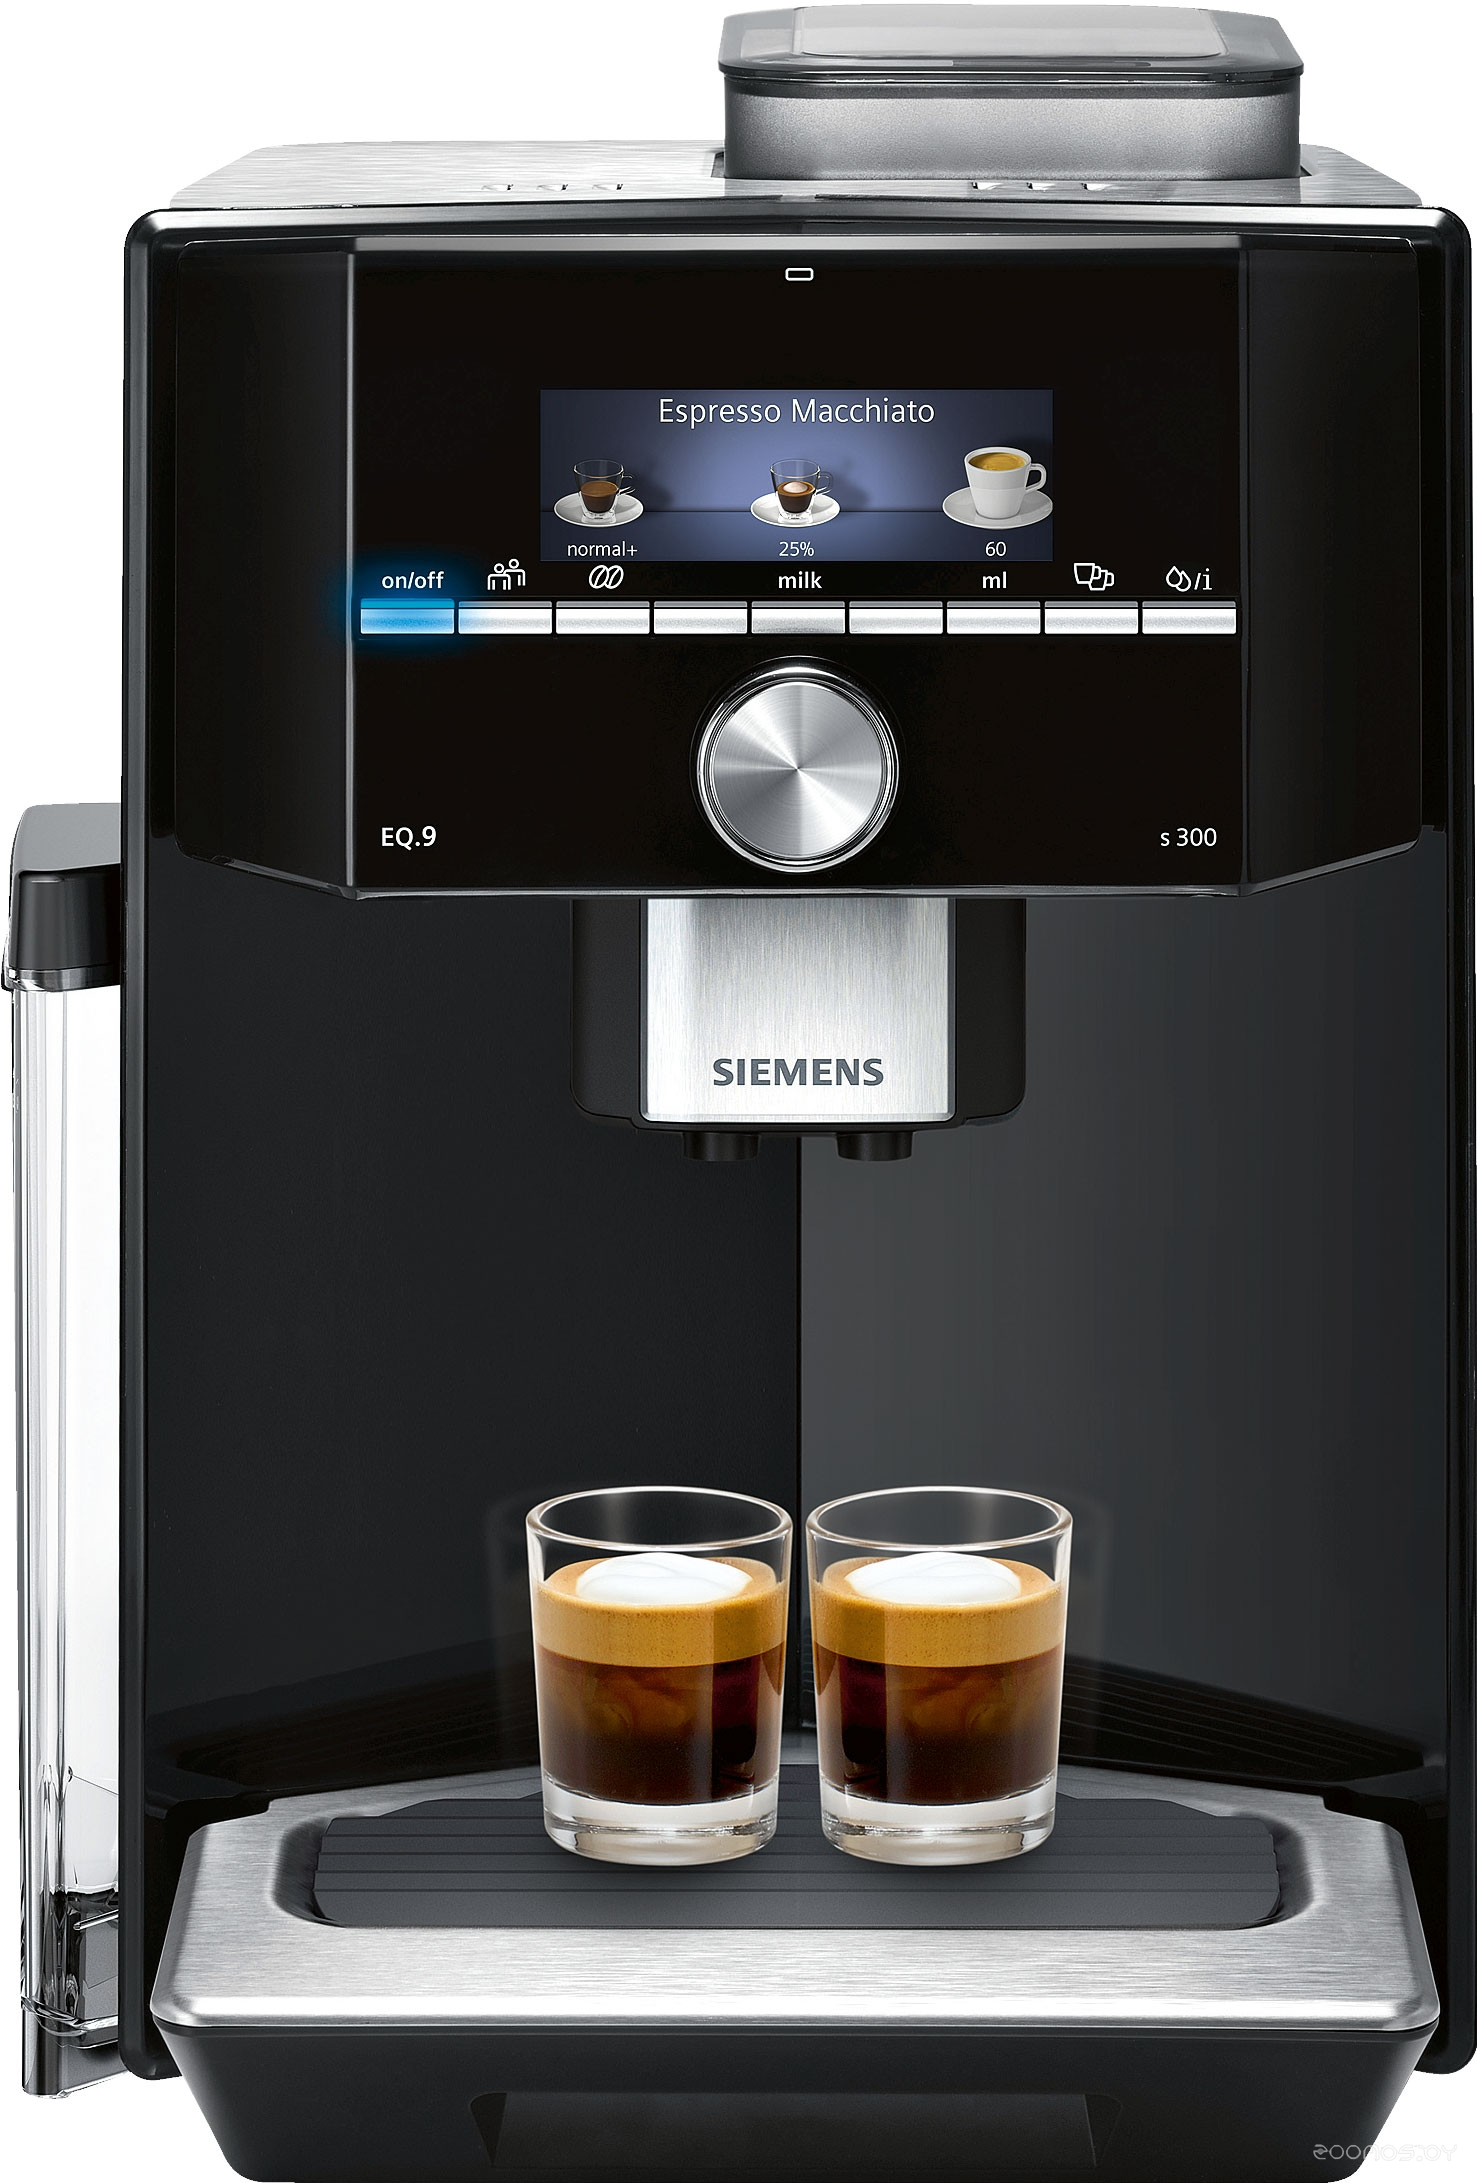 Кофемашина Siemens EQ.9 series 300 TI903209RW